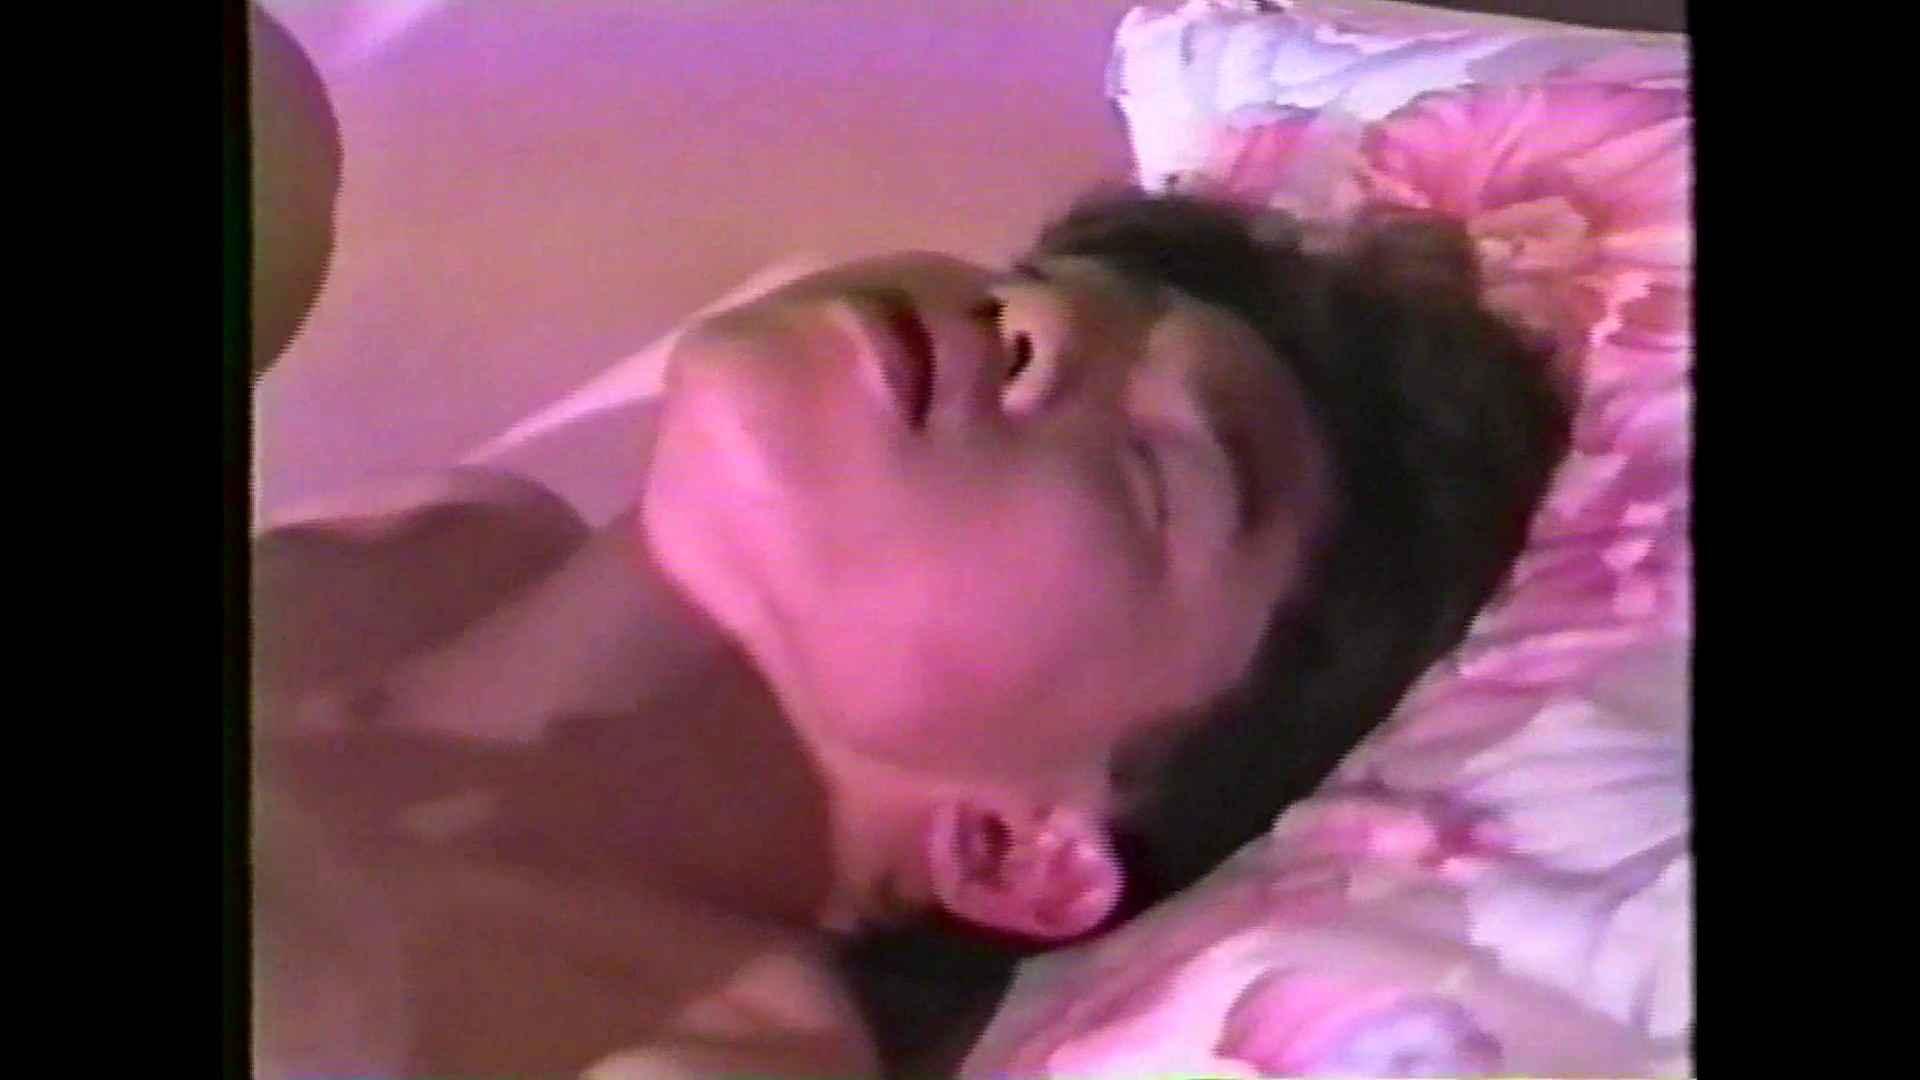 GAYBOY宏のオカズ倉庫Vol.2-1 ノンケ  89pic 87